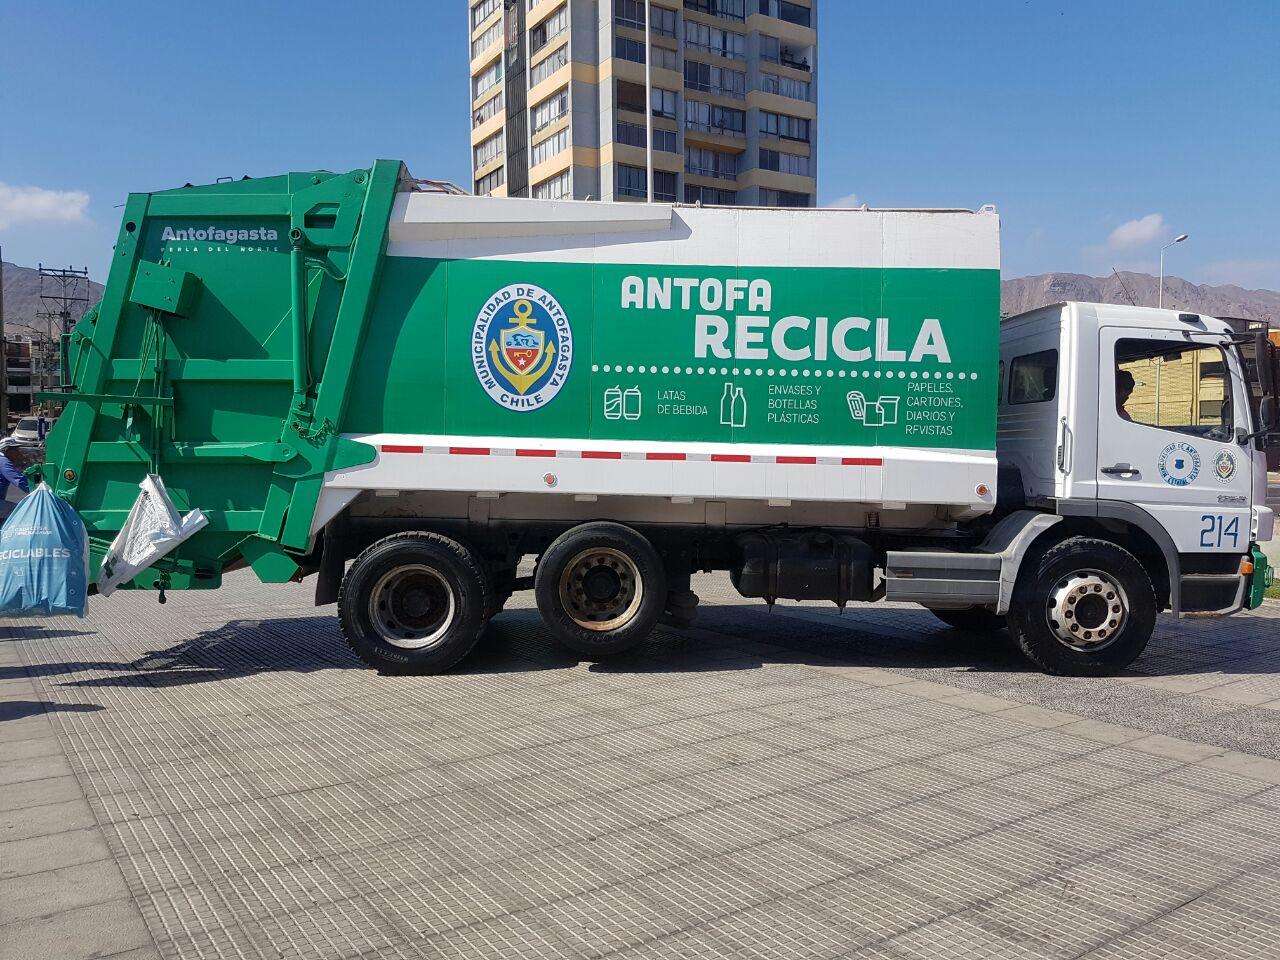 plan-de-recoleccion-de-basura-ampliara-cobertura-a-90-sectores-de-la-comuna